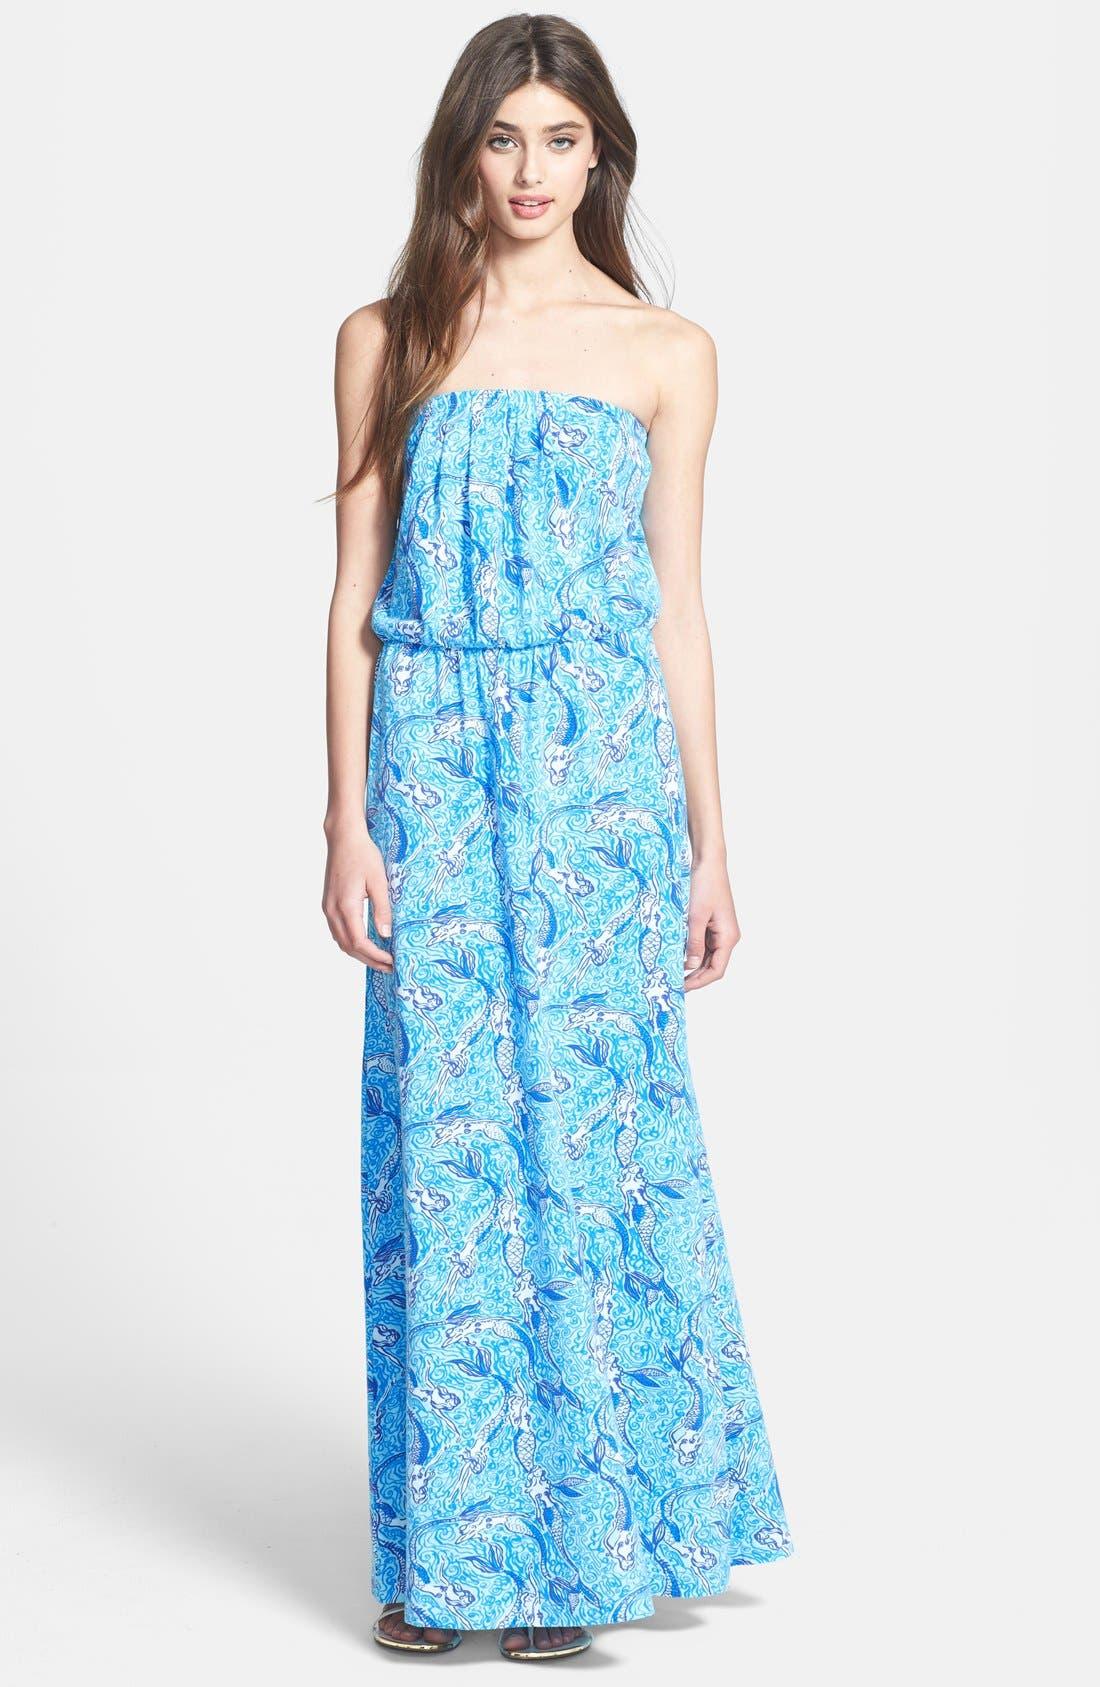 Main Image - Lilly Pulitzer® 'Marlisa' Print Blouson Jersey Maxi Dress